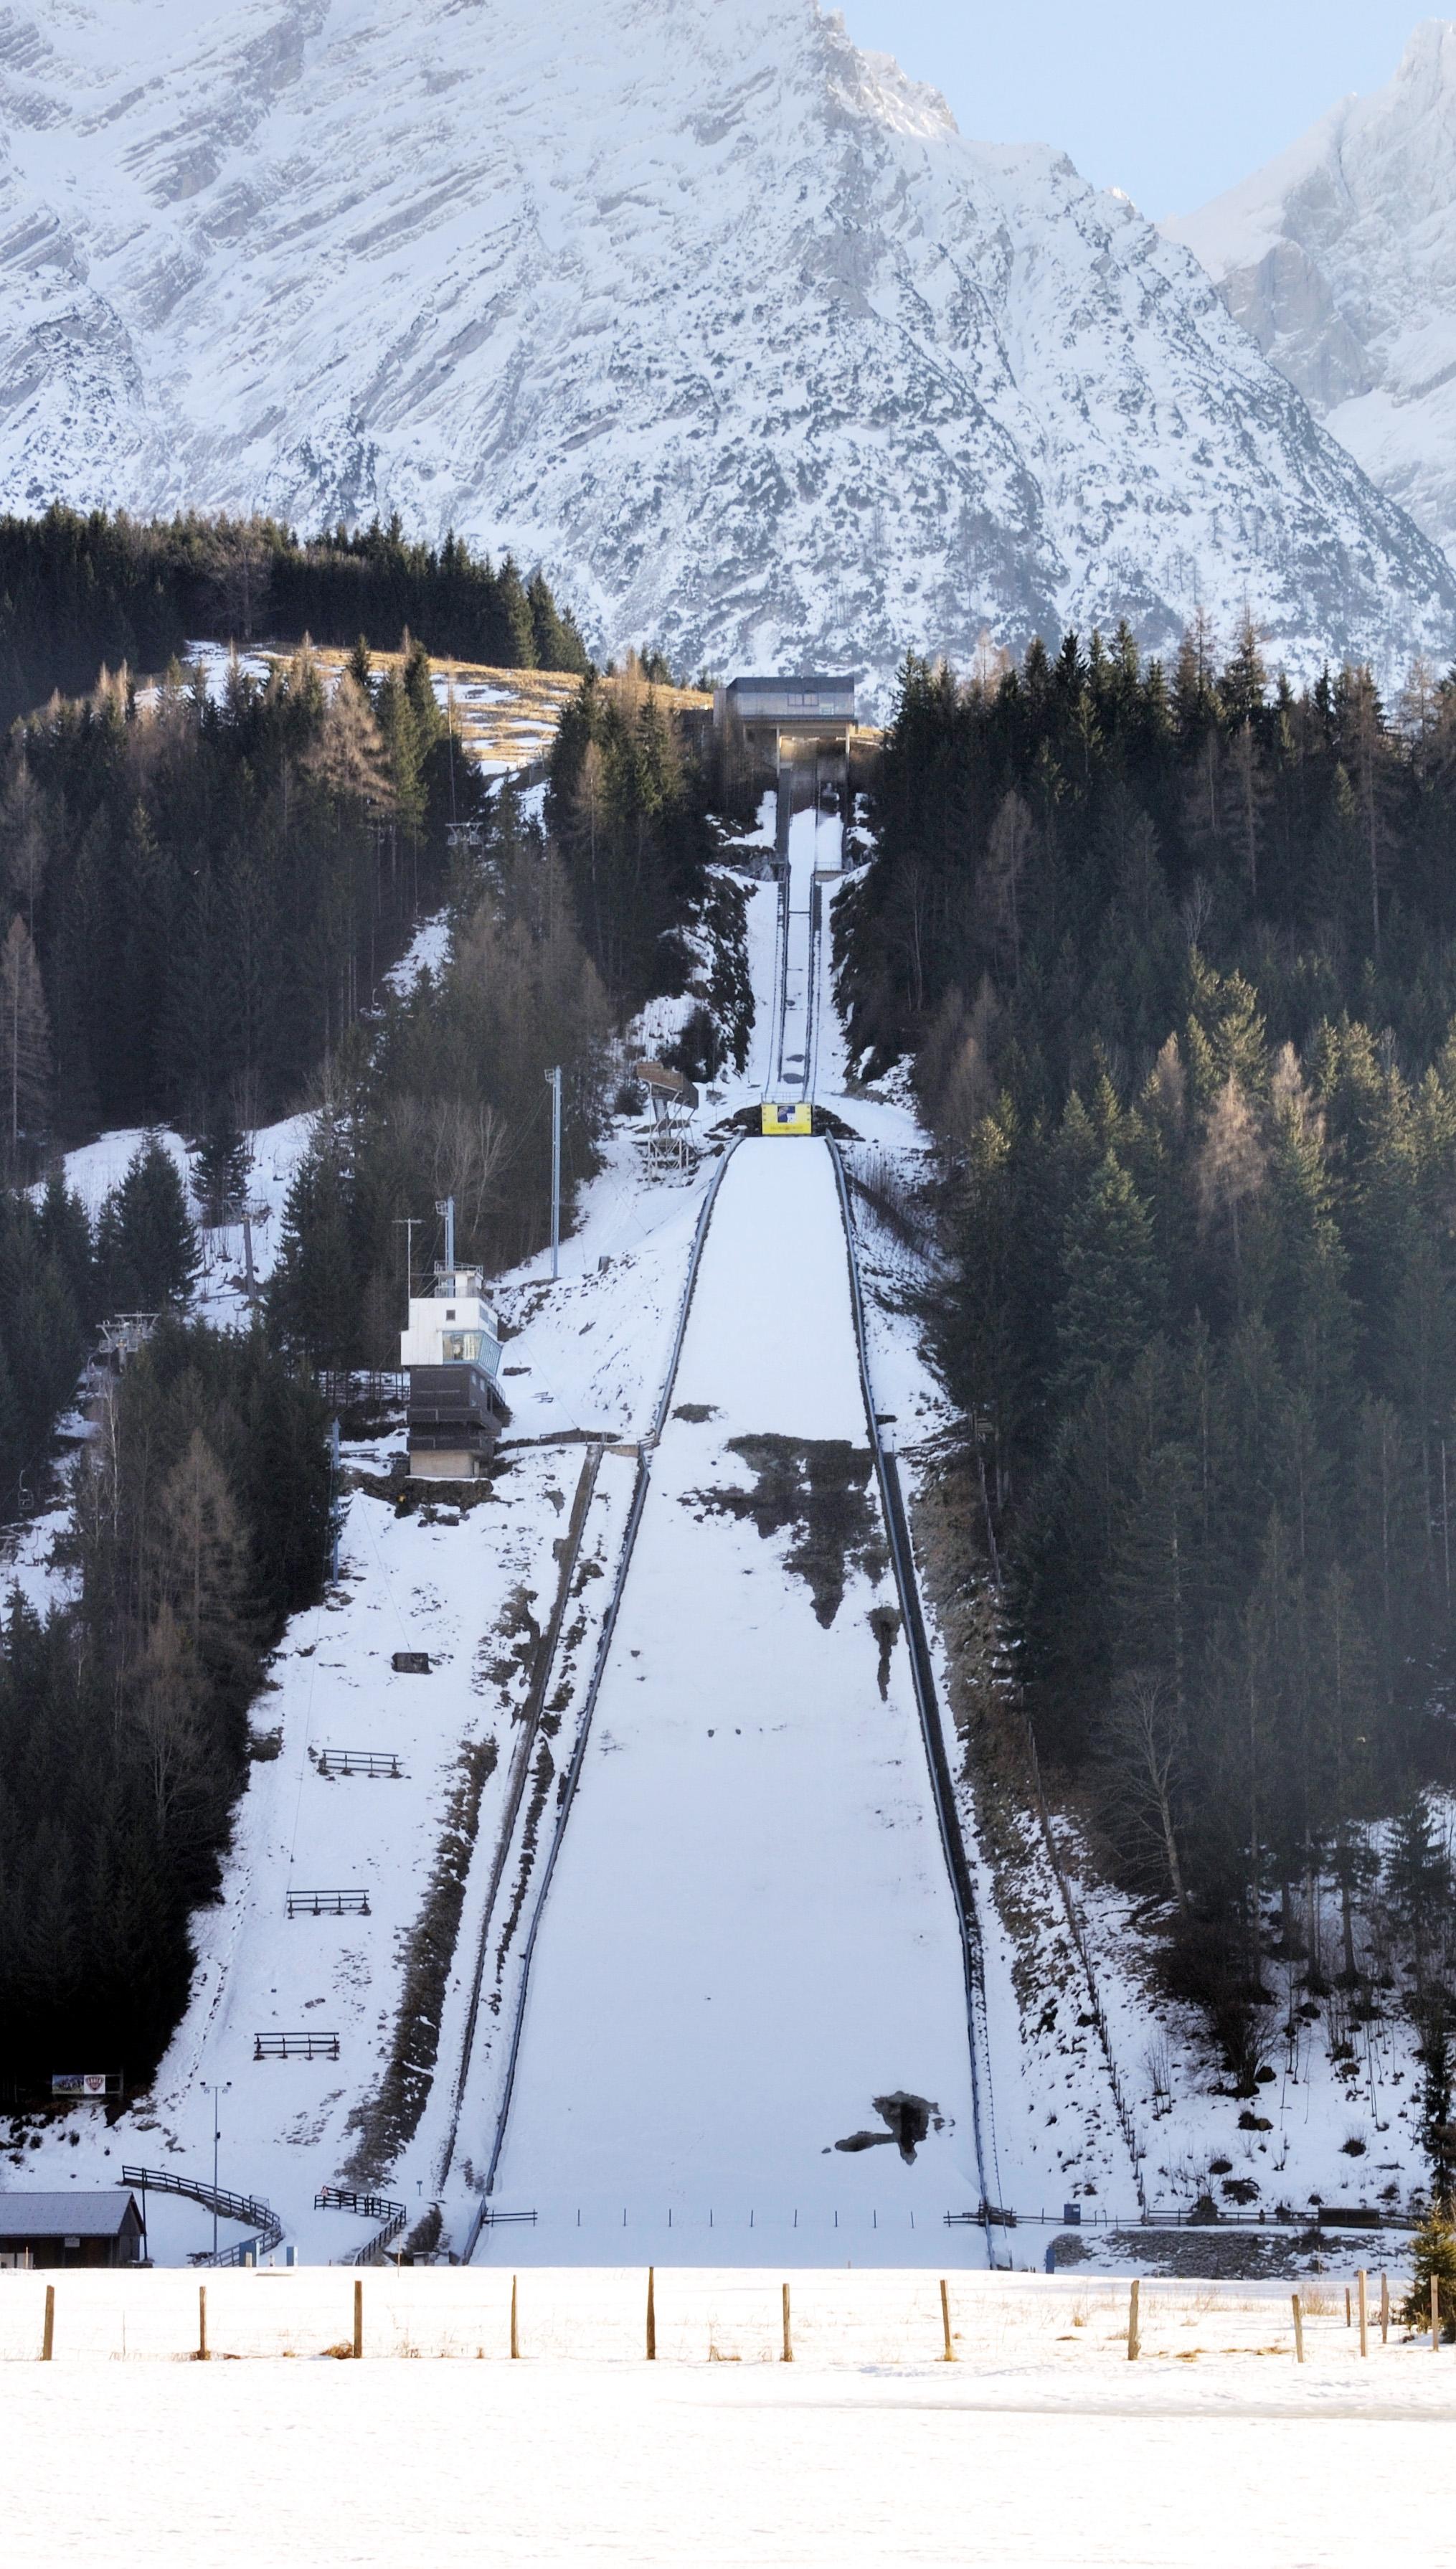 File:Kulm - Skiflugschanze2.jpg - Wikimedia Commons